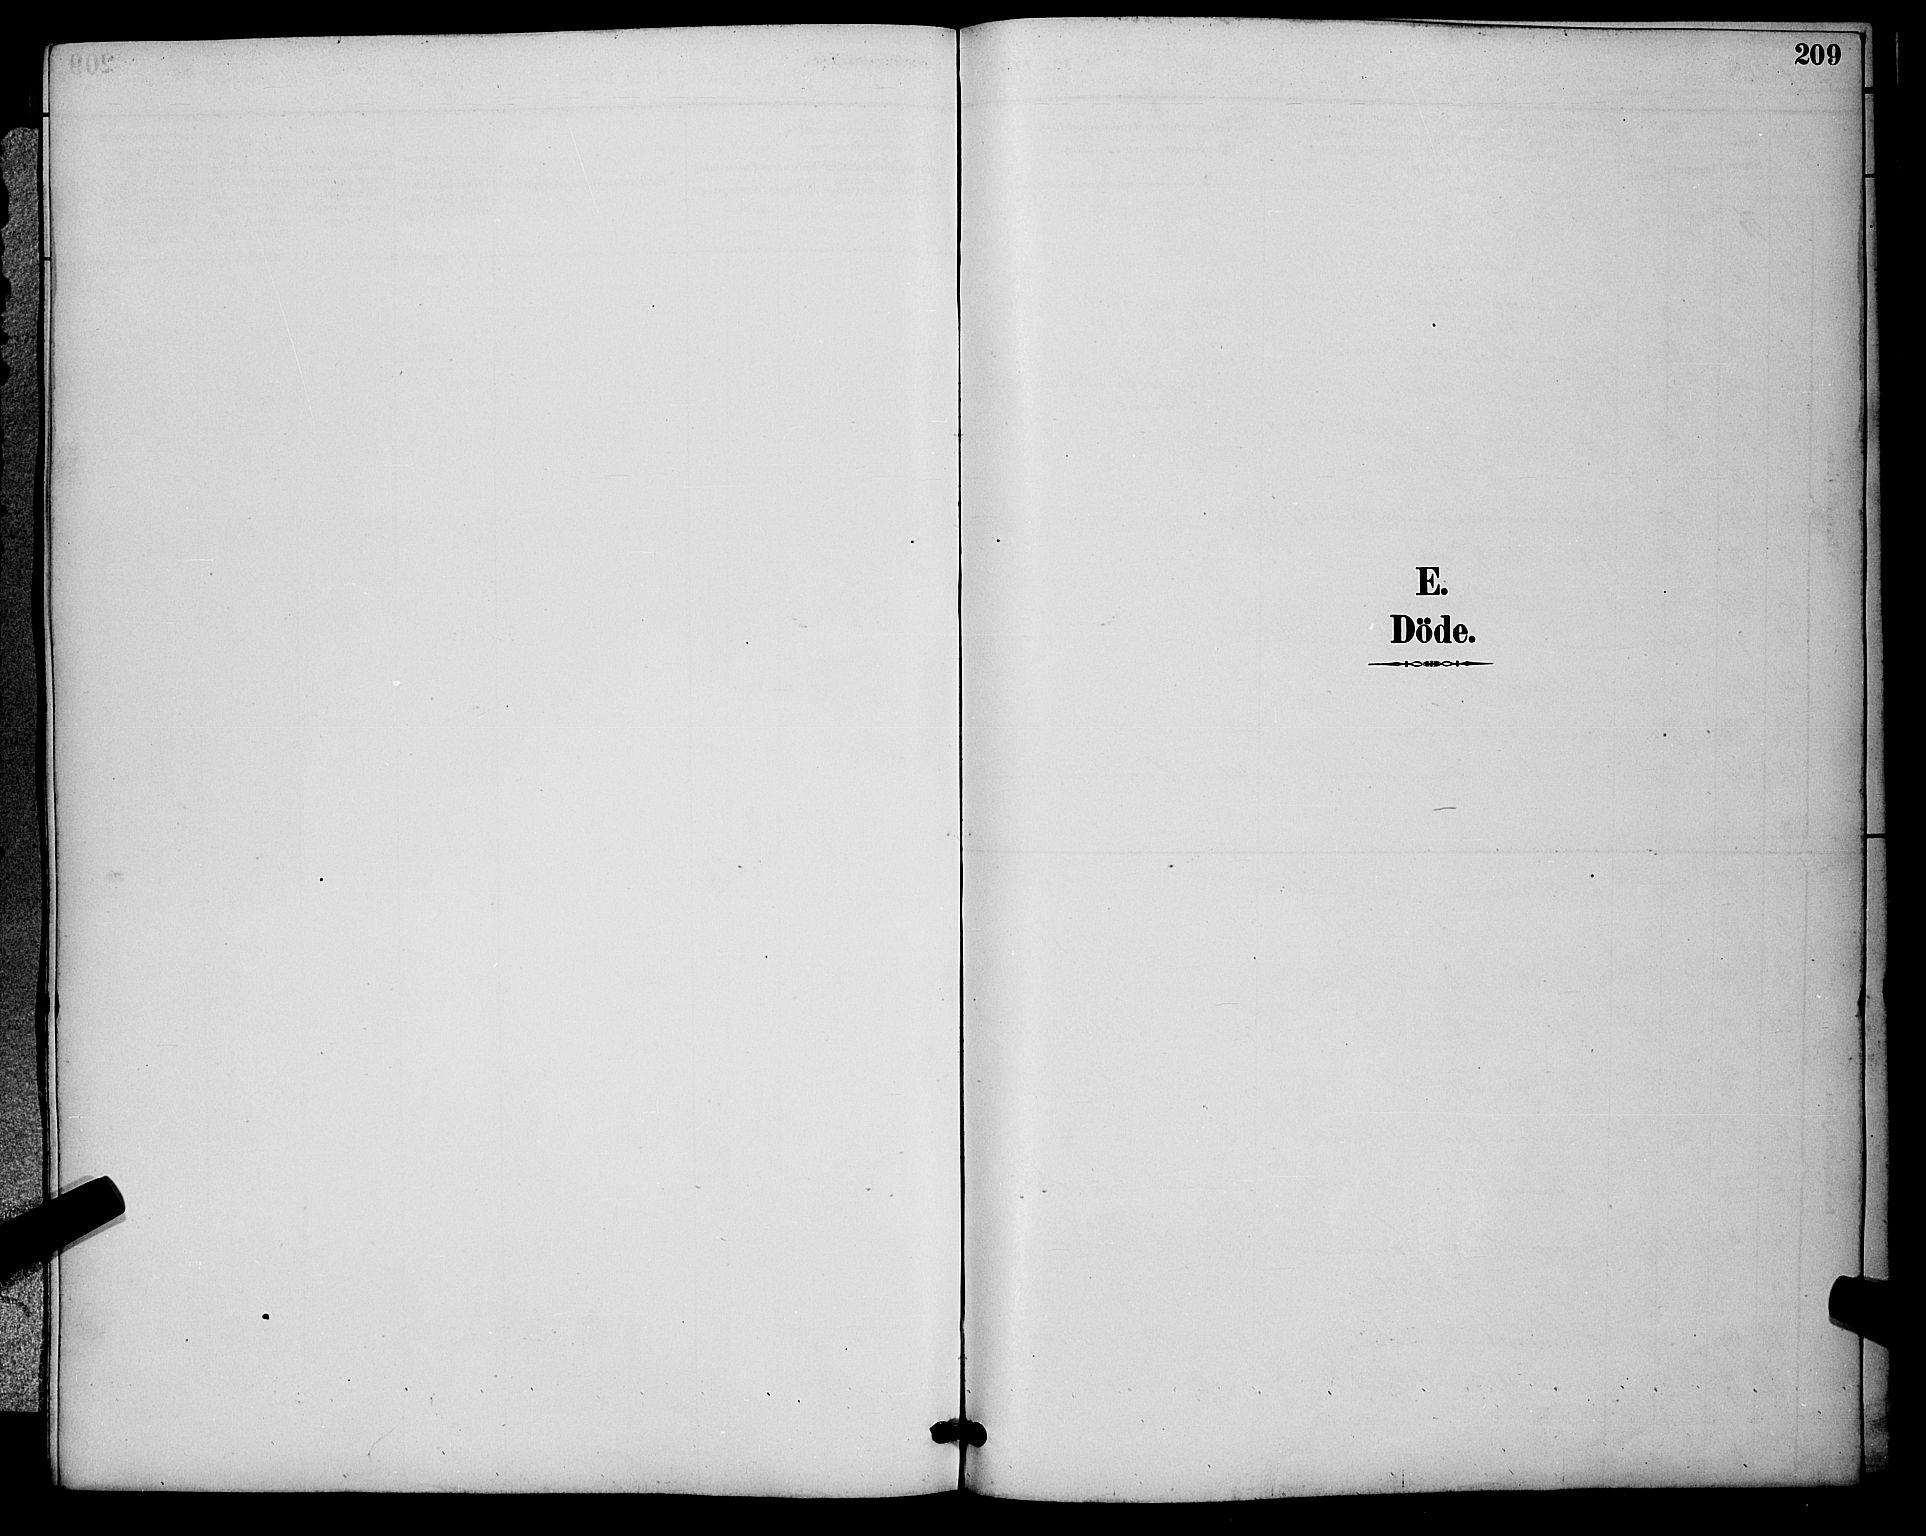 SAKO, Sigdal kirkebøker, G/Ga/L0005: Klokkerbok nr. I 5, 1886-1900, s. 209